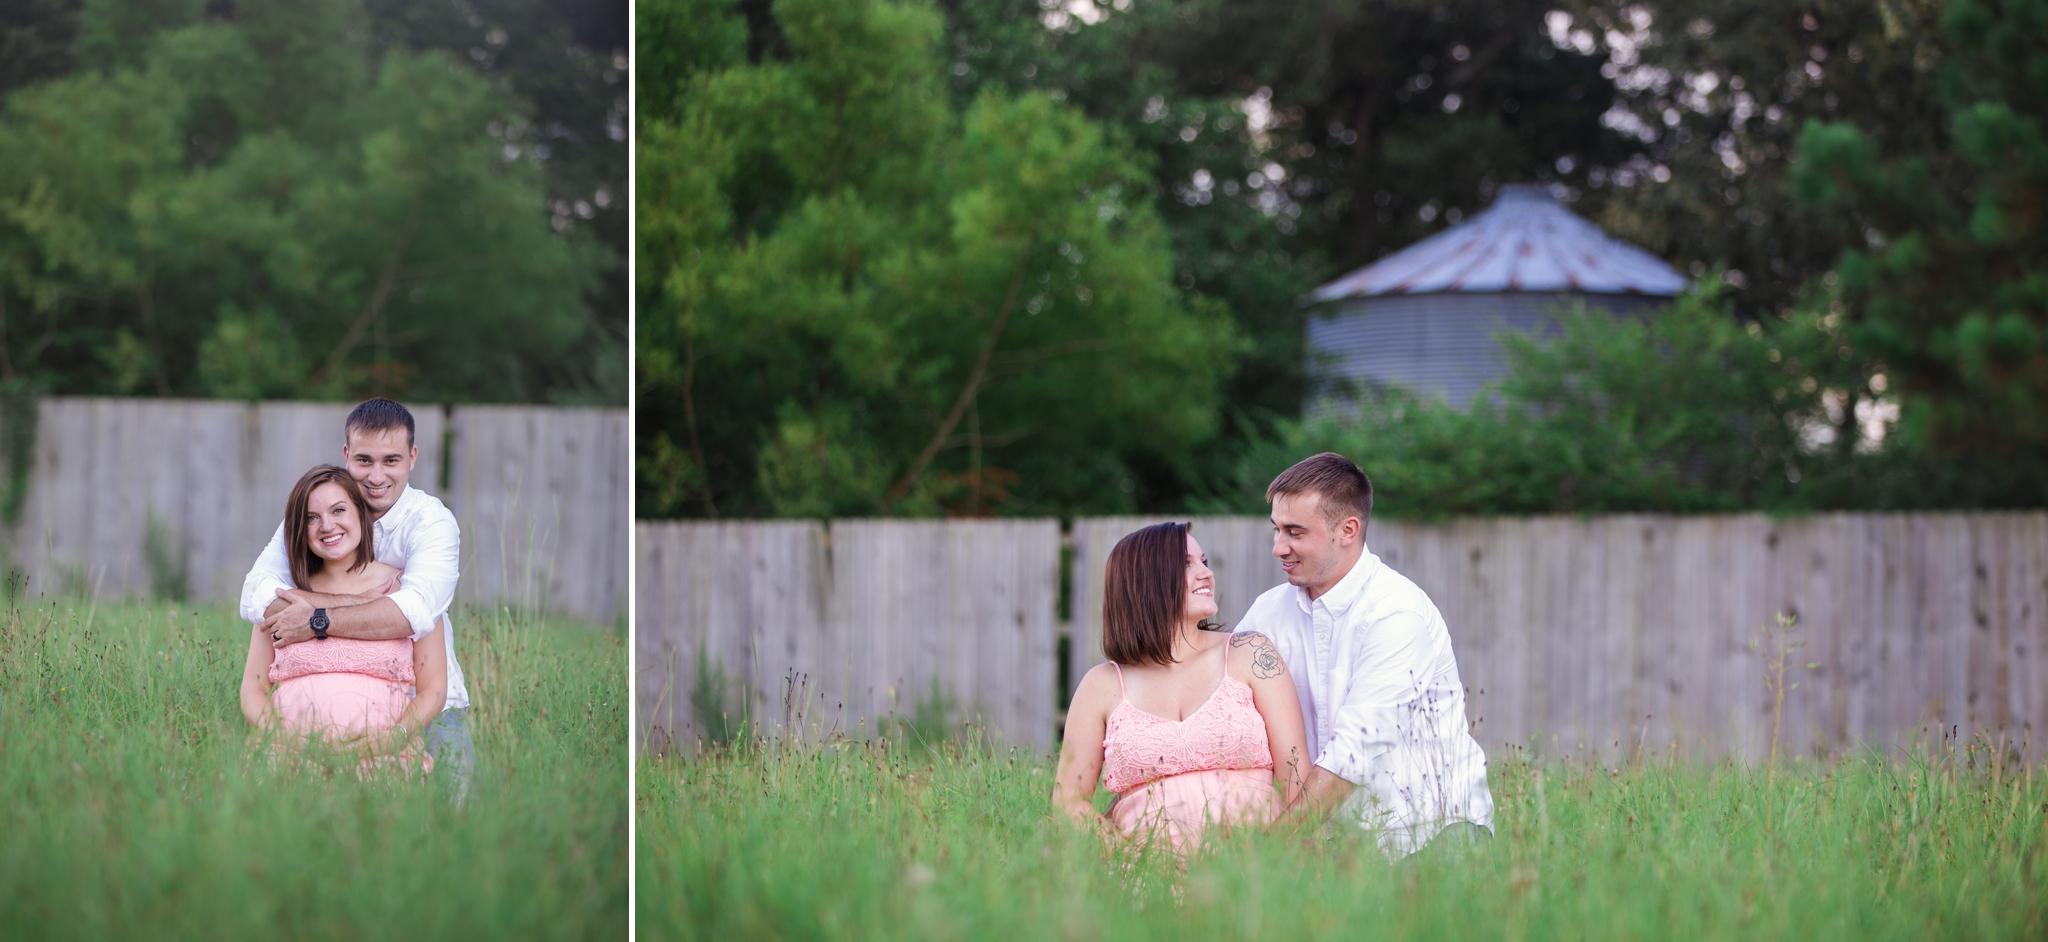 Fayetteville North Carolina Maternity Photography